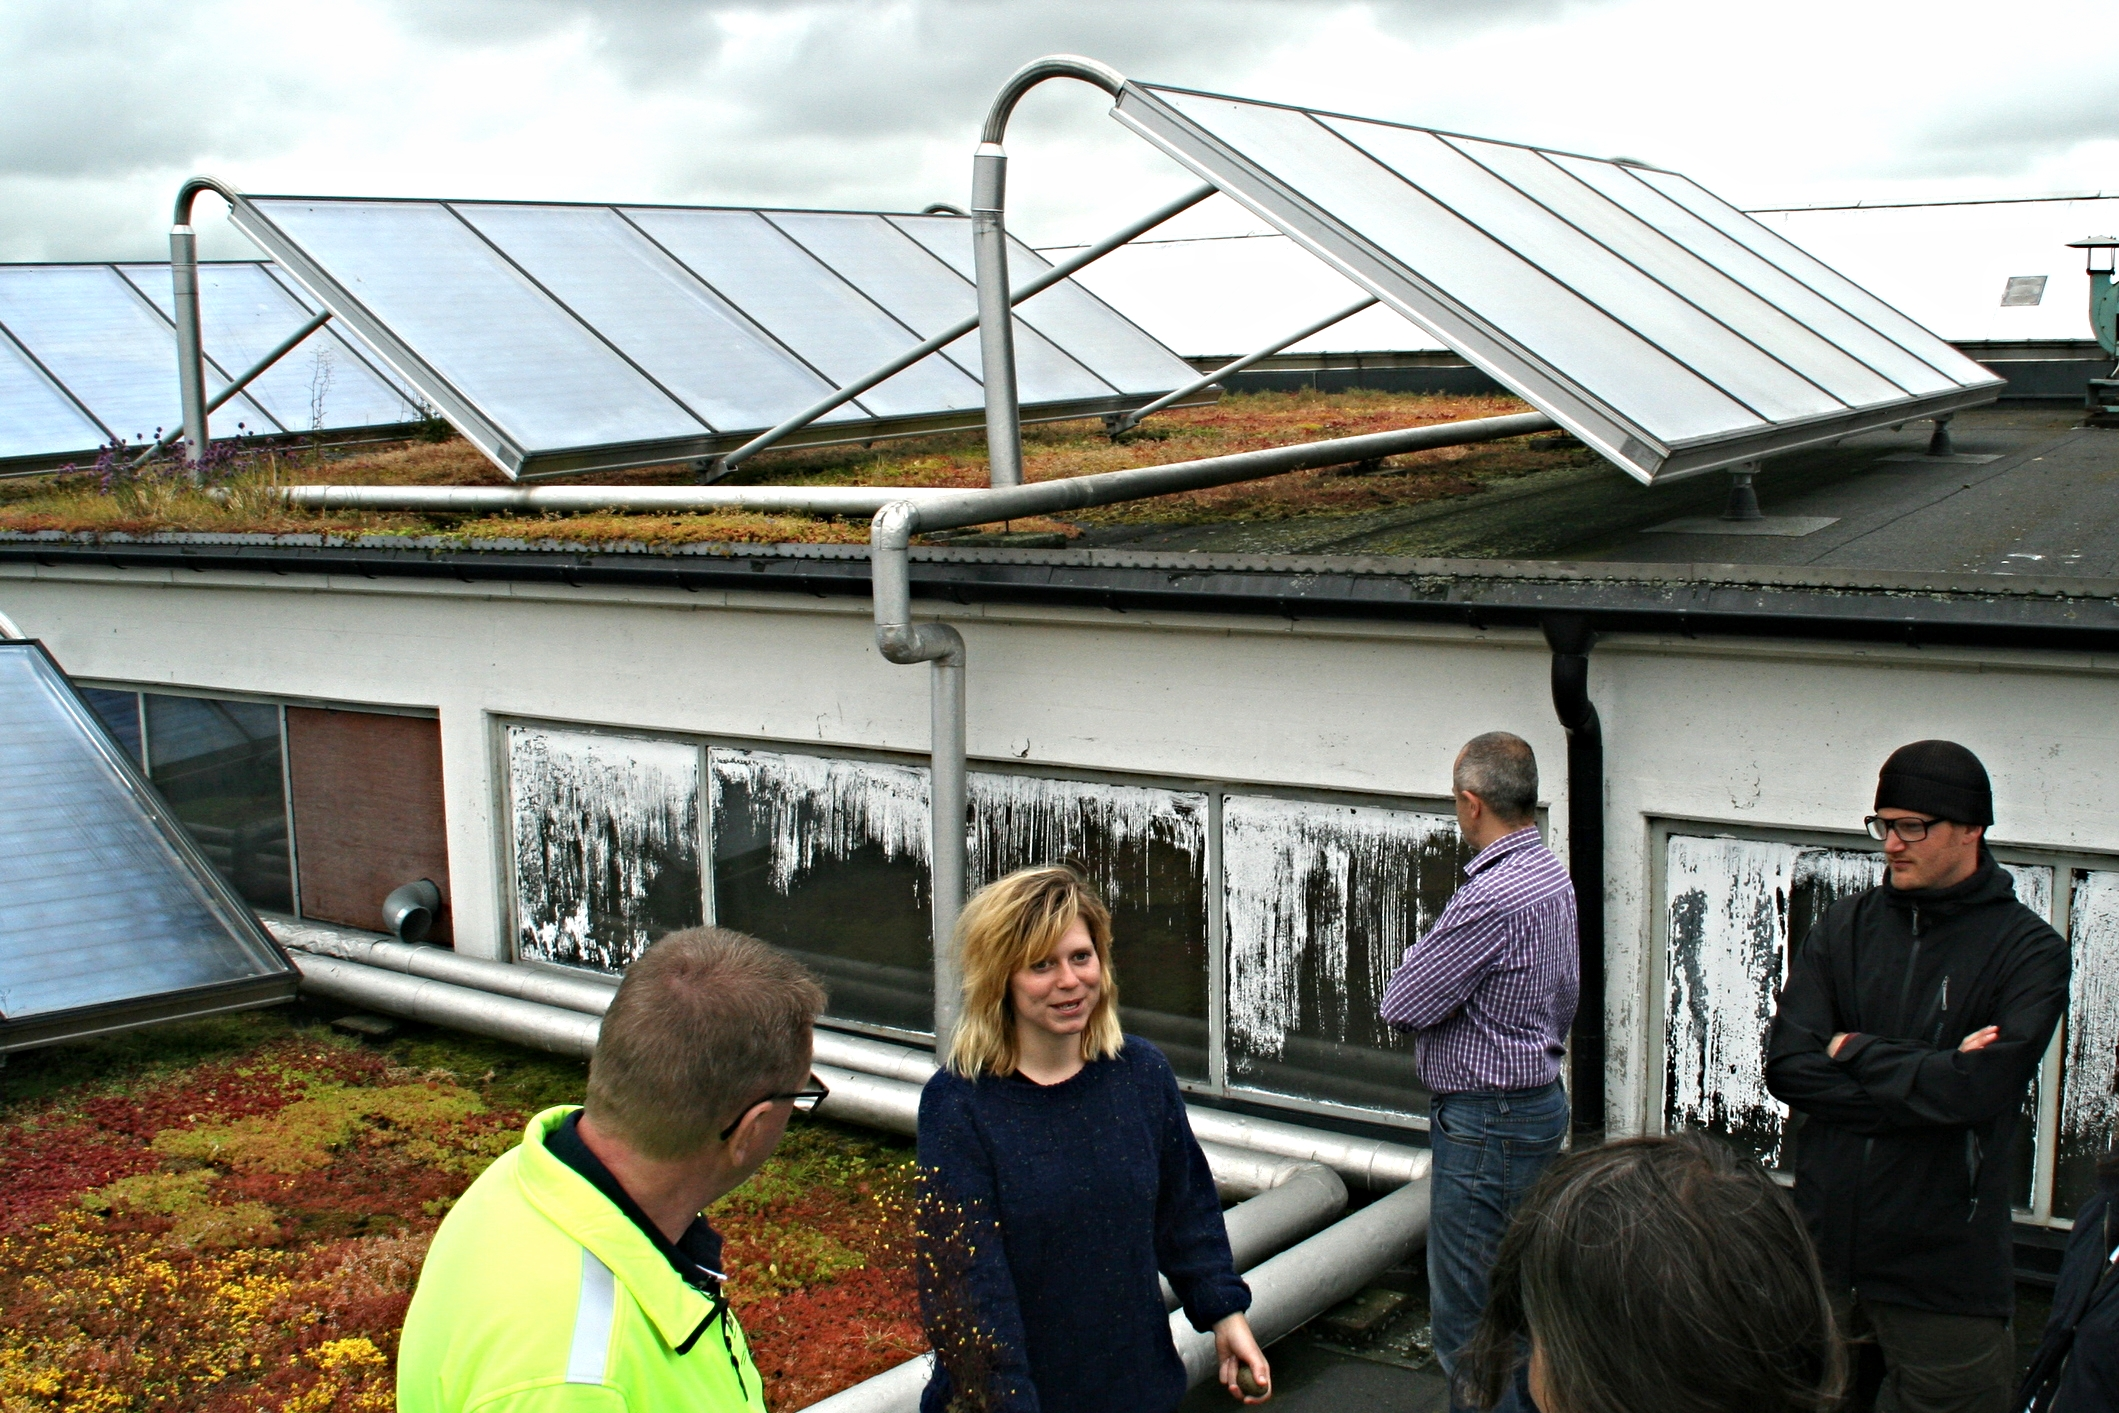 Green Roof Maintenance.Klara Asp, Scandinavian Green Roof Institute.